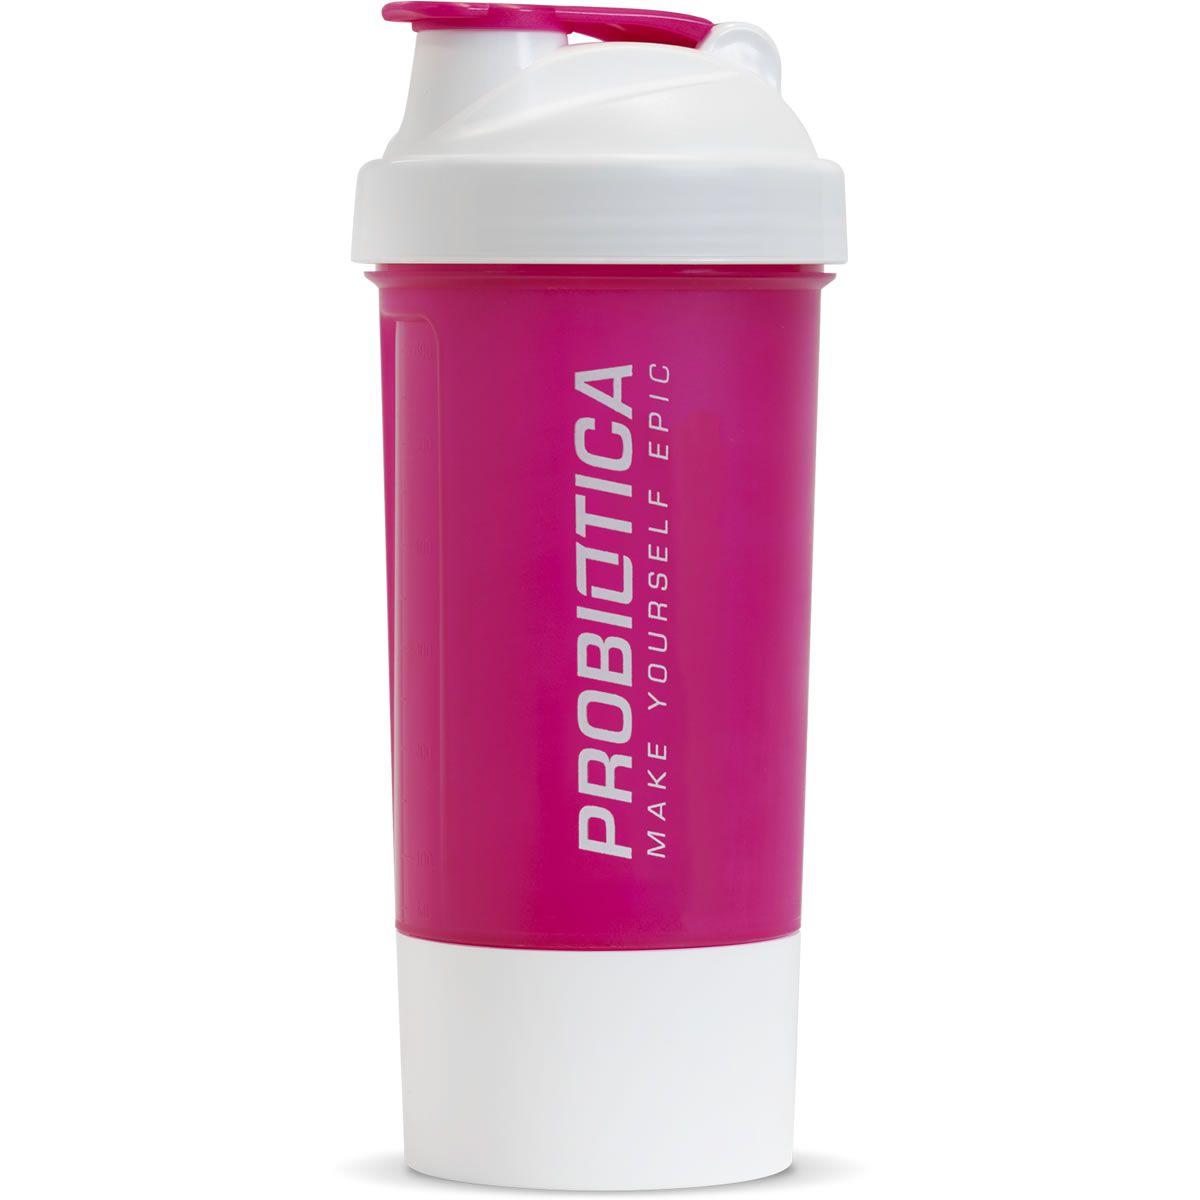 Coqueteleira Premium 2 Doses (700ml) Probiótica